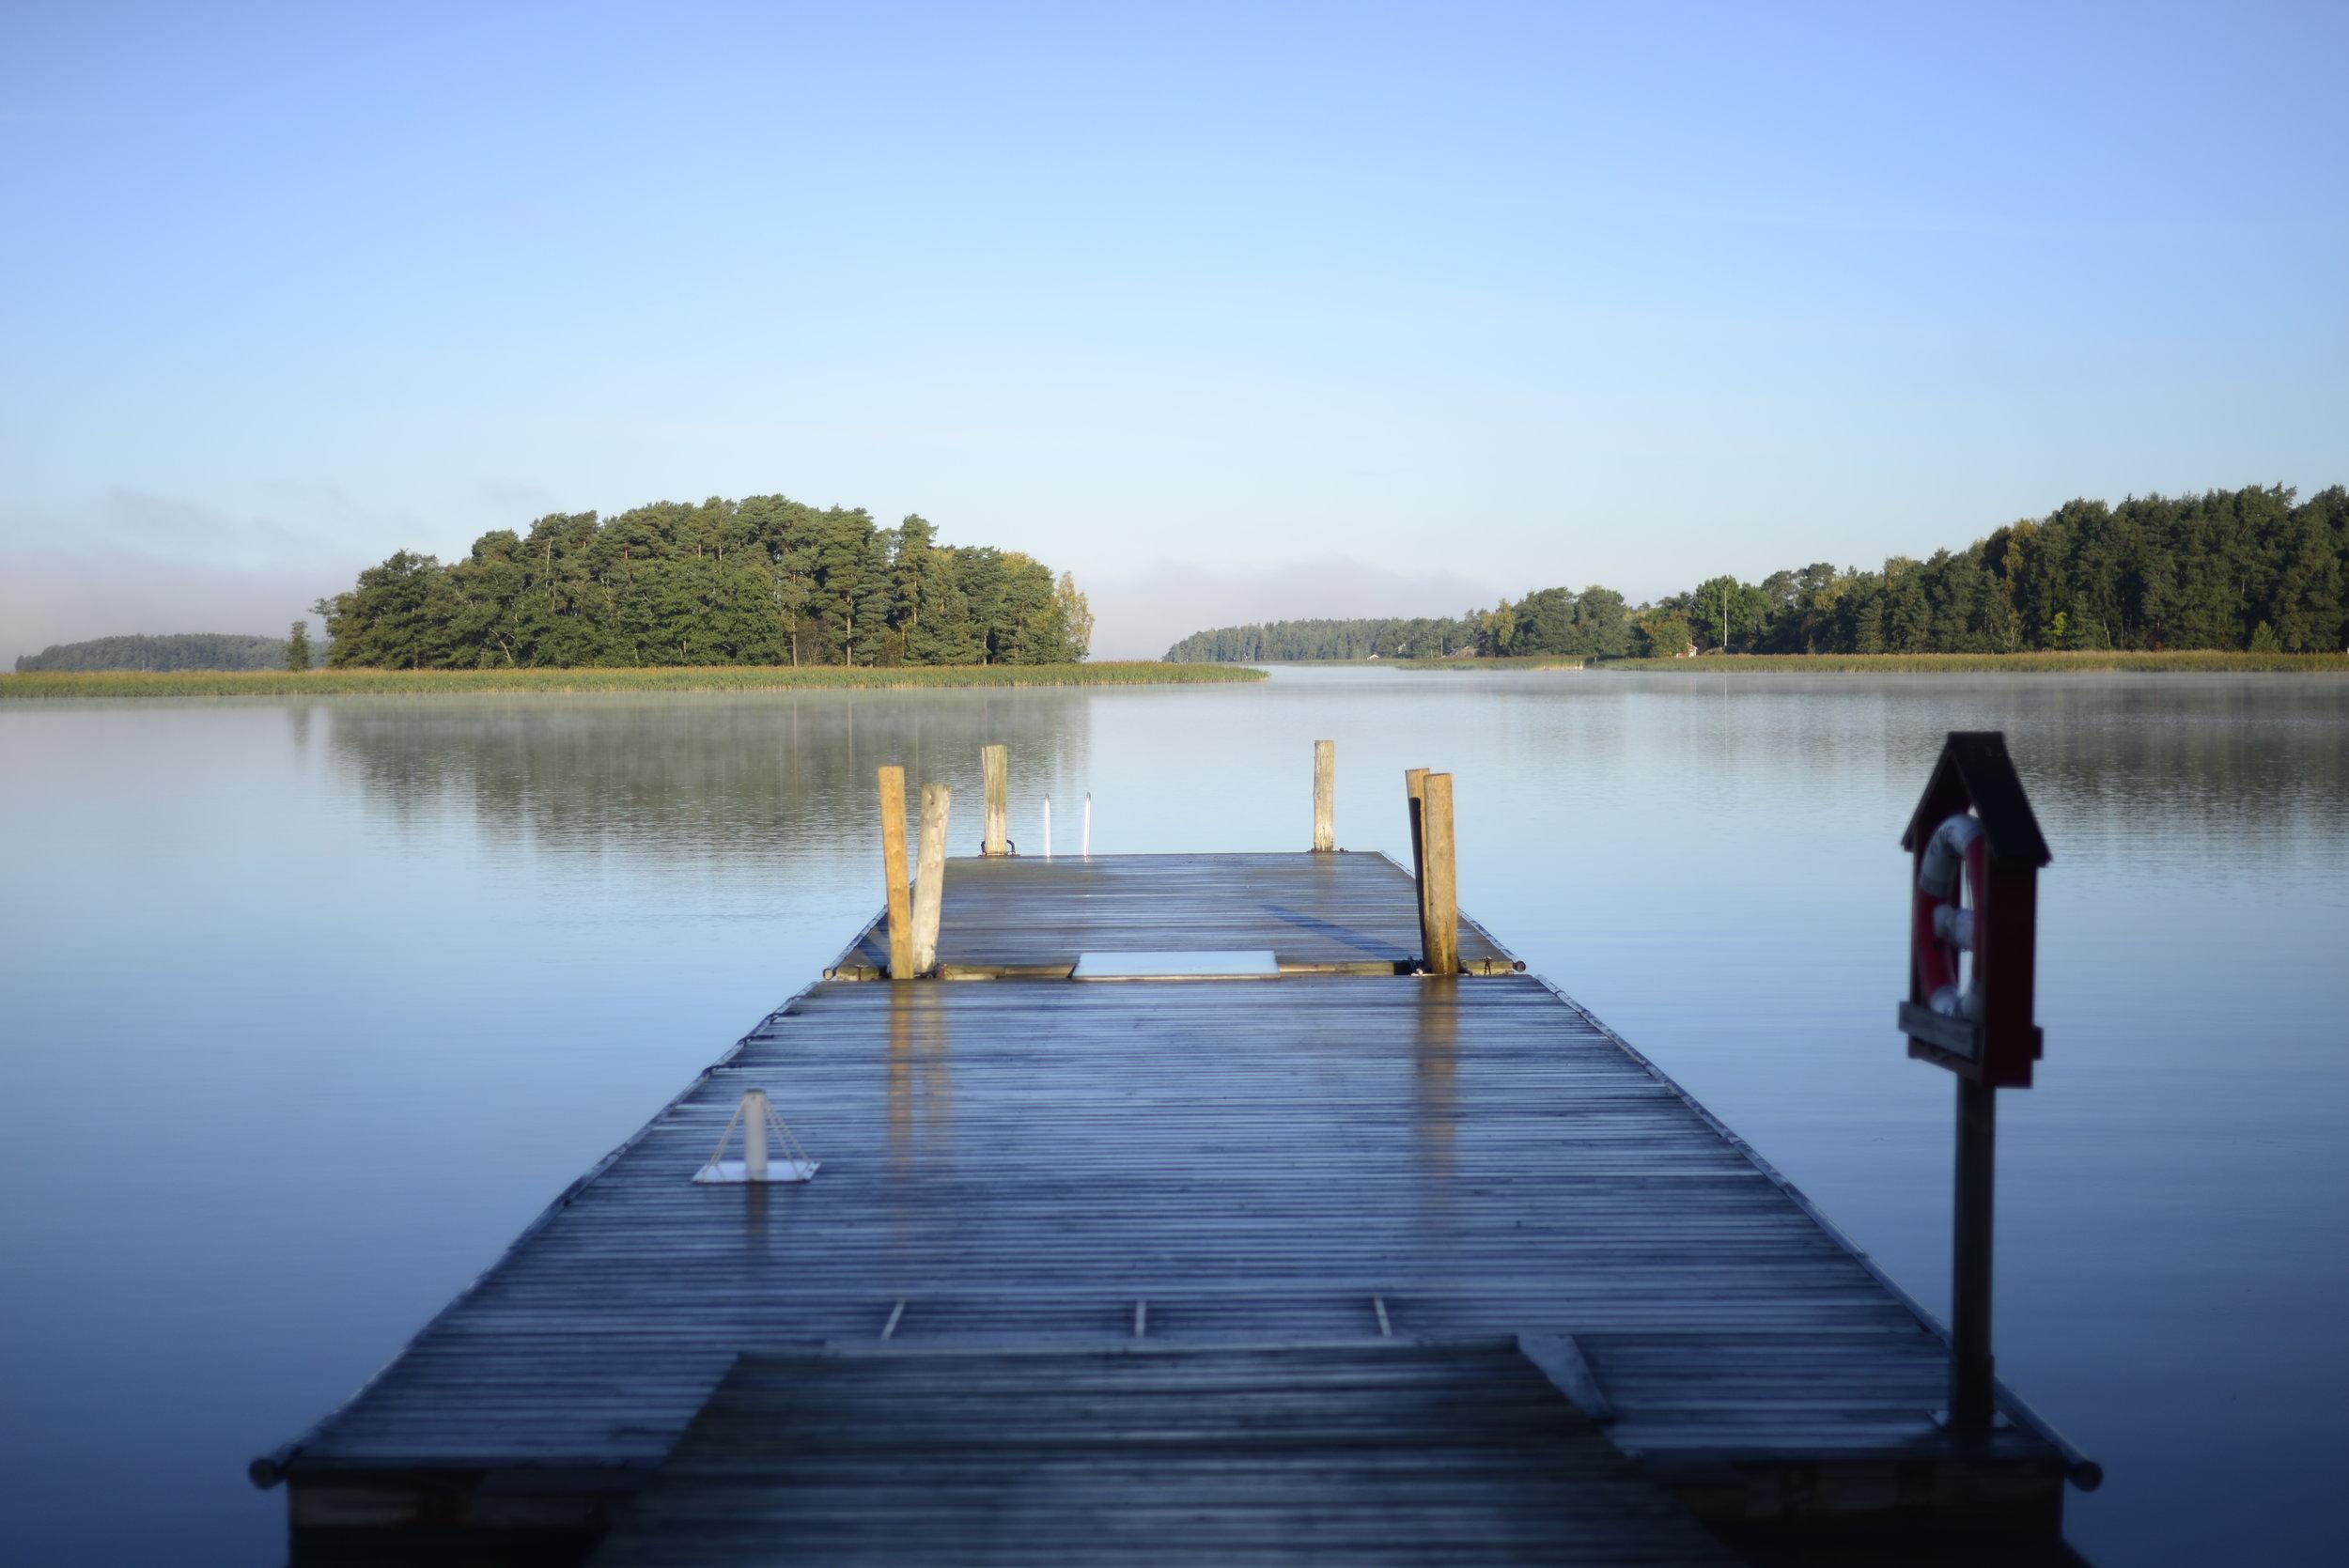 Screw Jack Kit for Boat Docks Adjustable HeightDIY